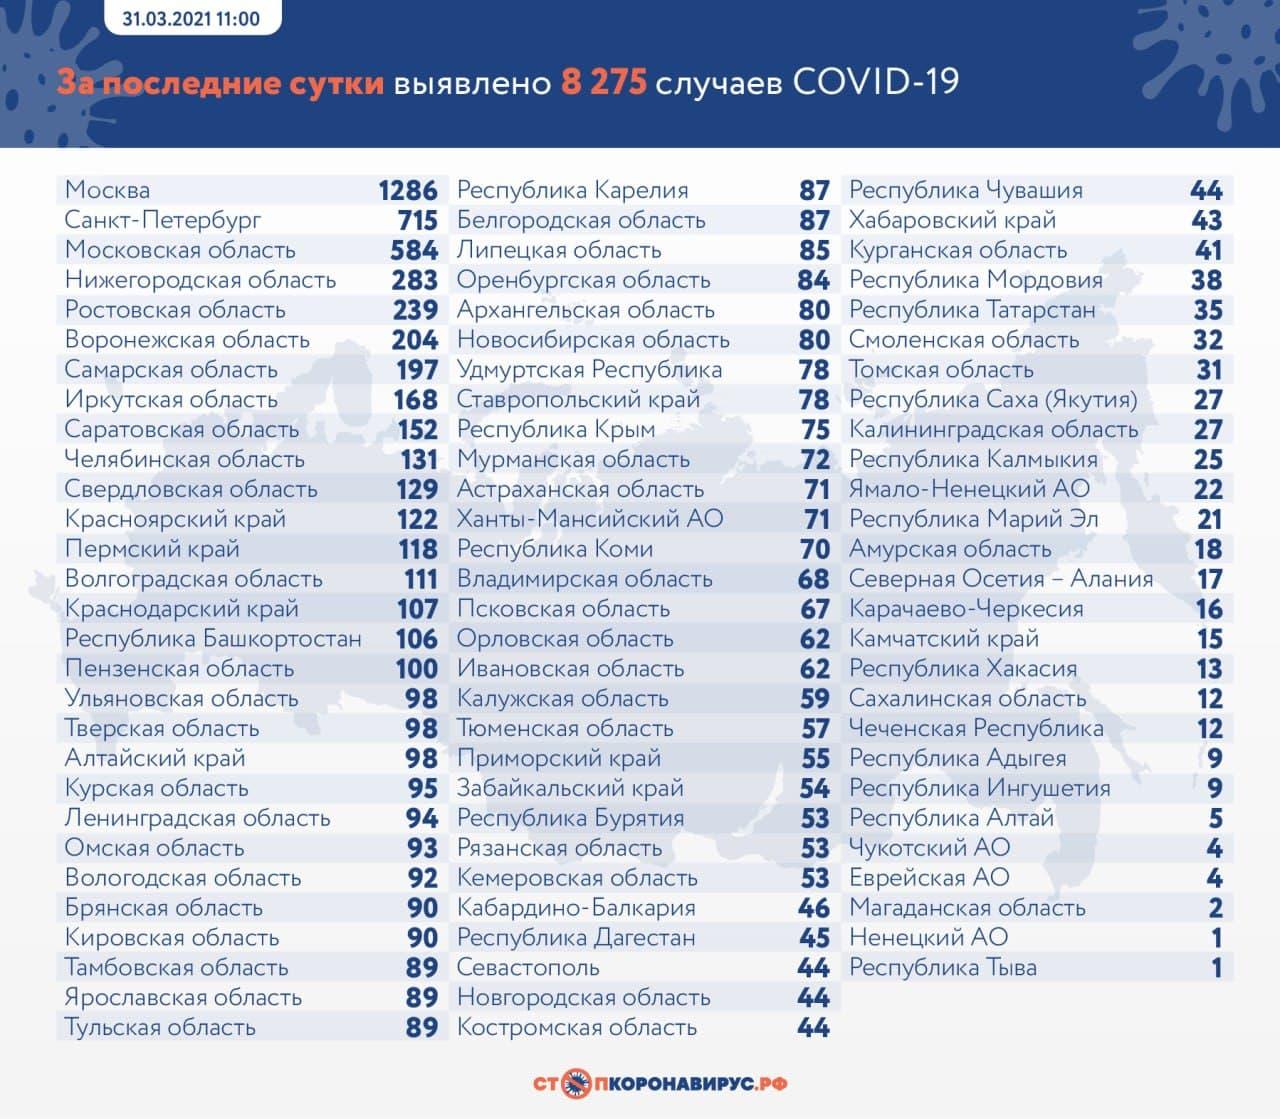 Оперативная статистика по коронавирусу в России на 31 марта